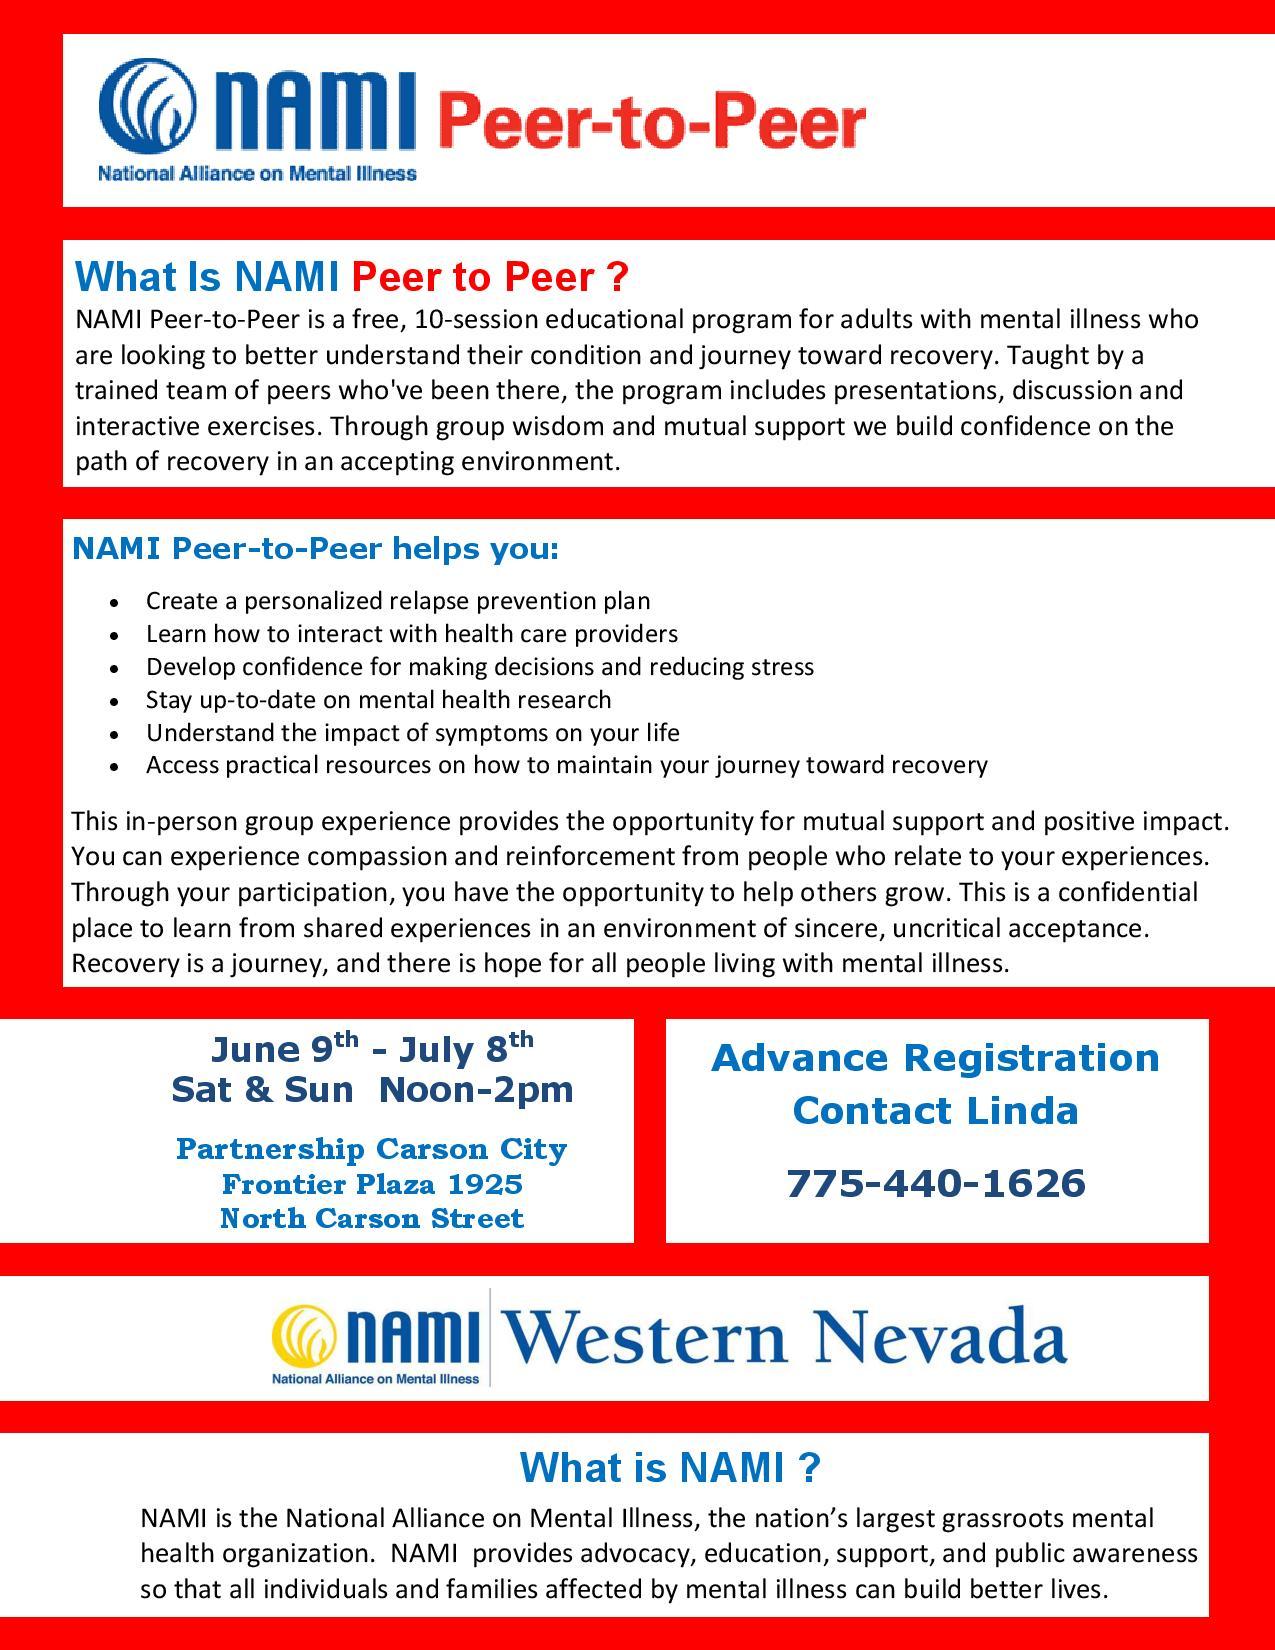 P2P Carson City Summer 2018-page-001.jpg